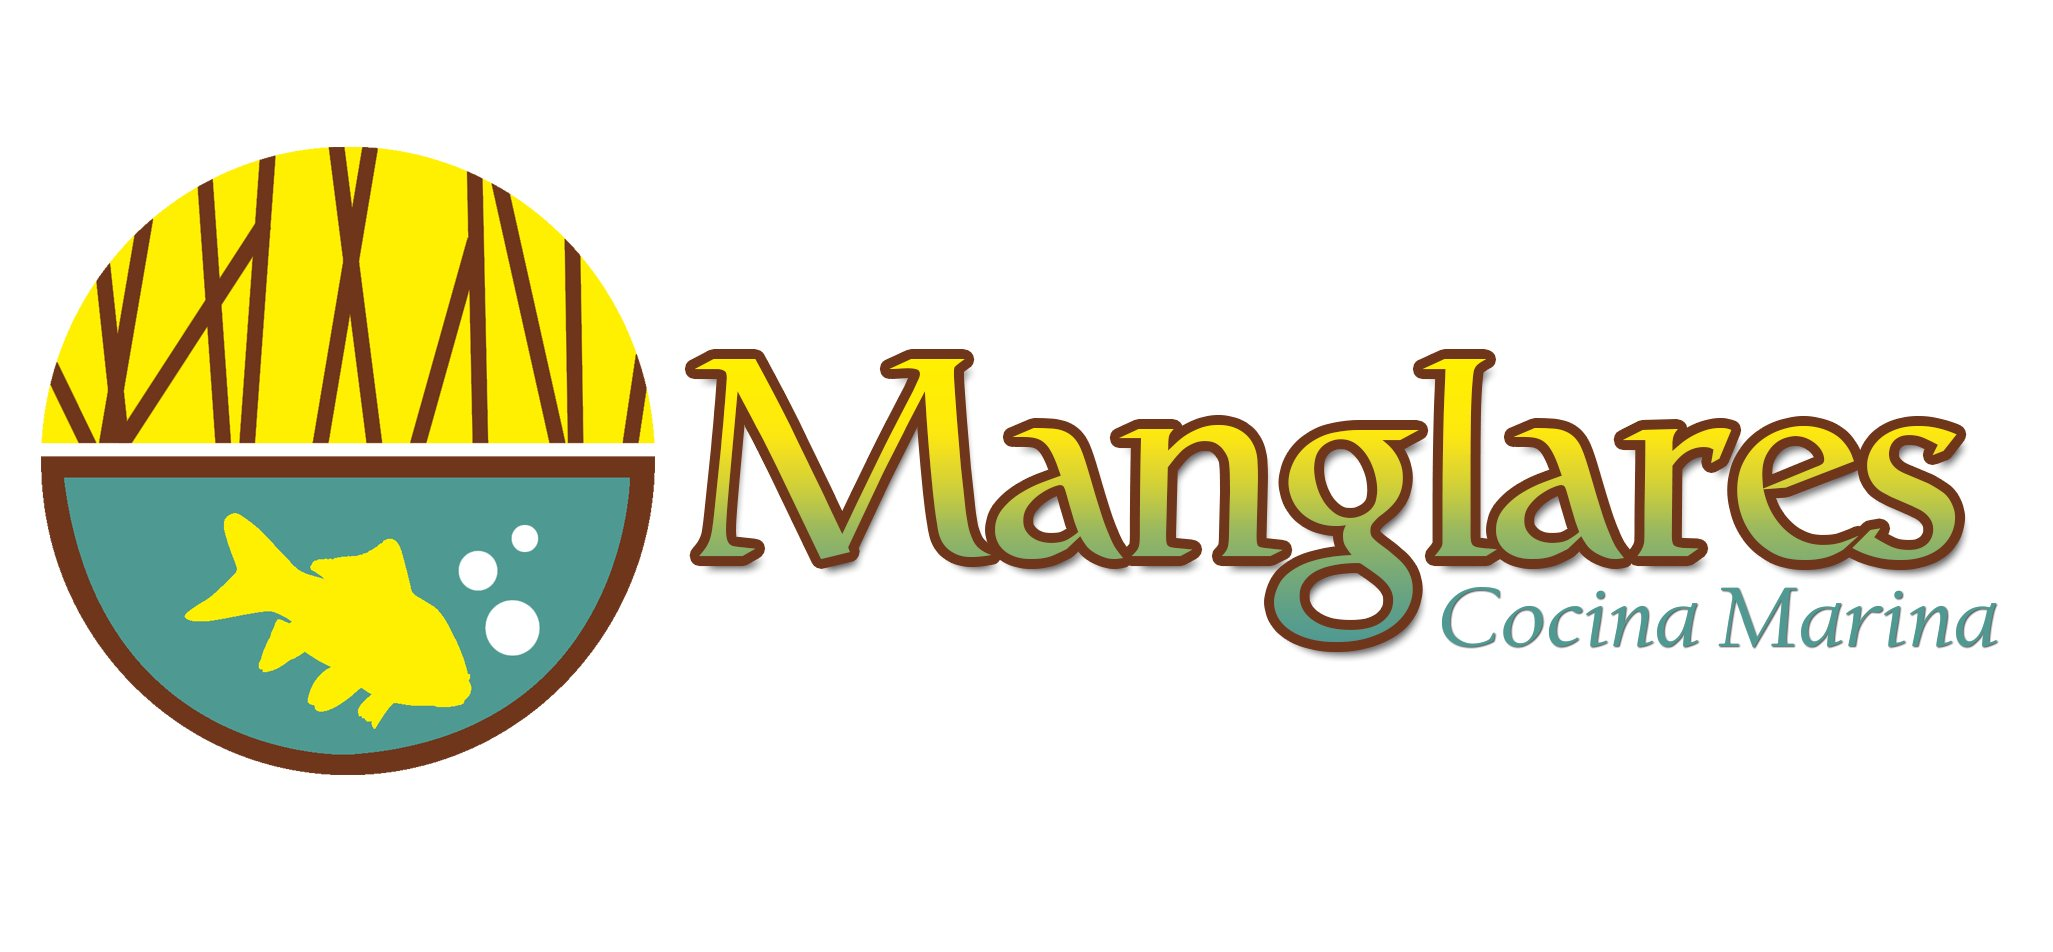 Manglares Cocina Marina